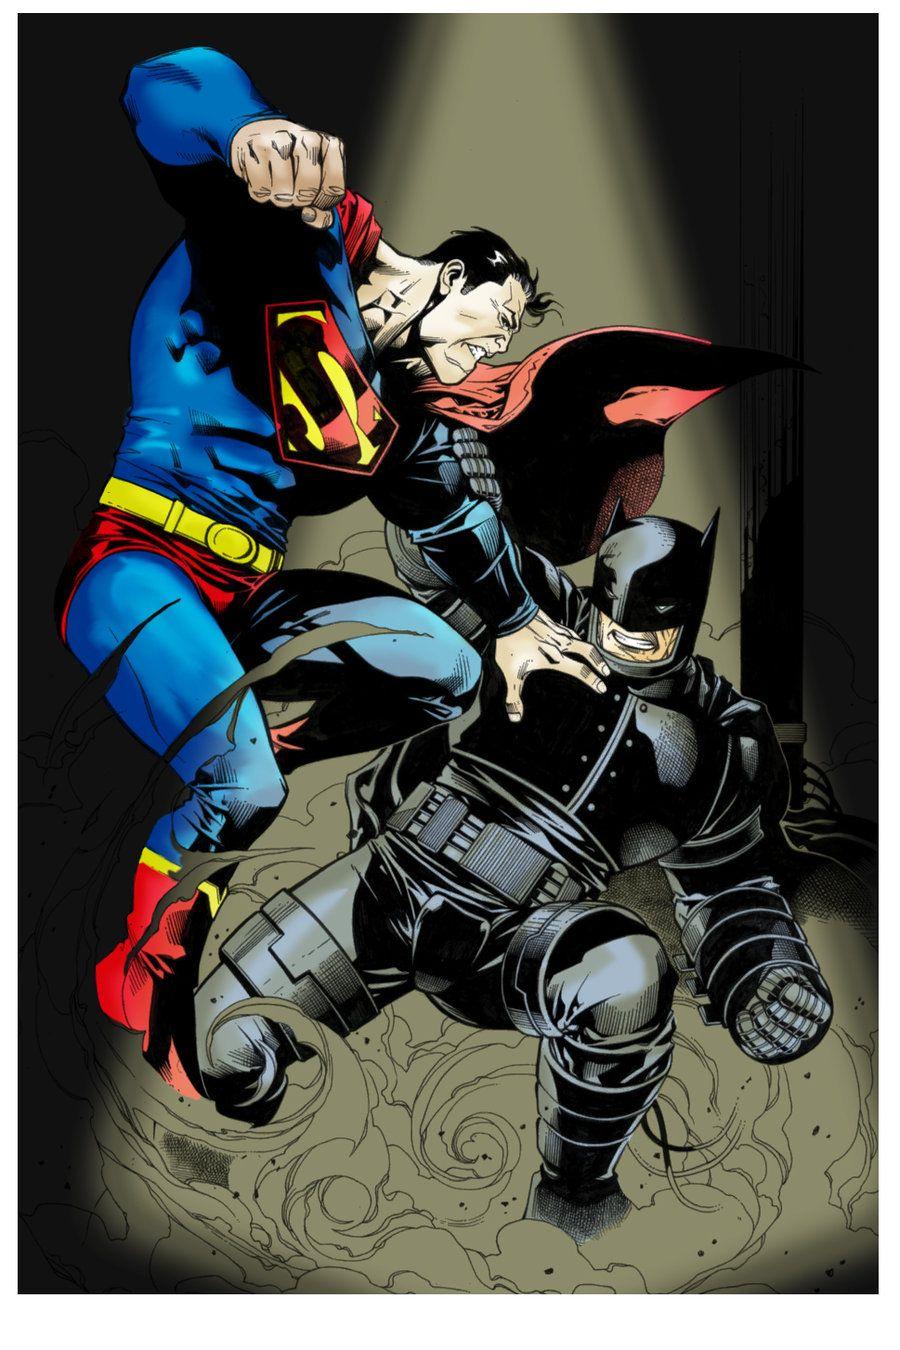 Dark Knight Returns by boniface984